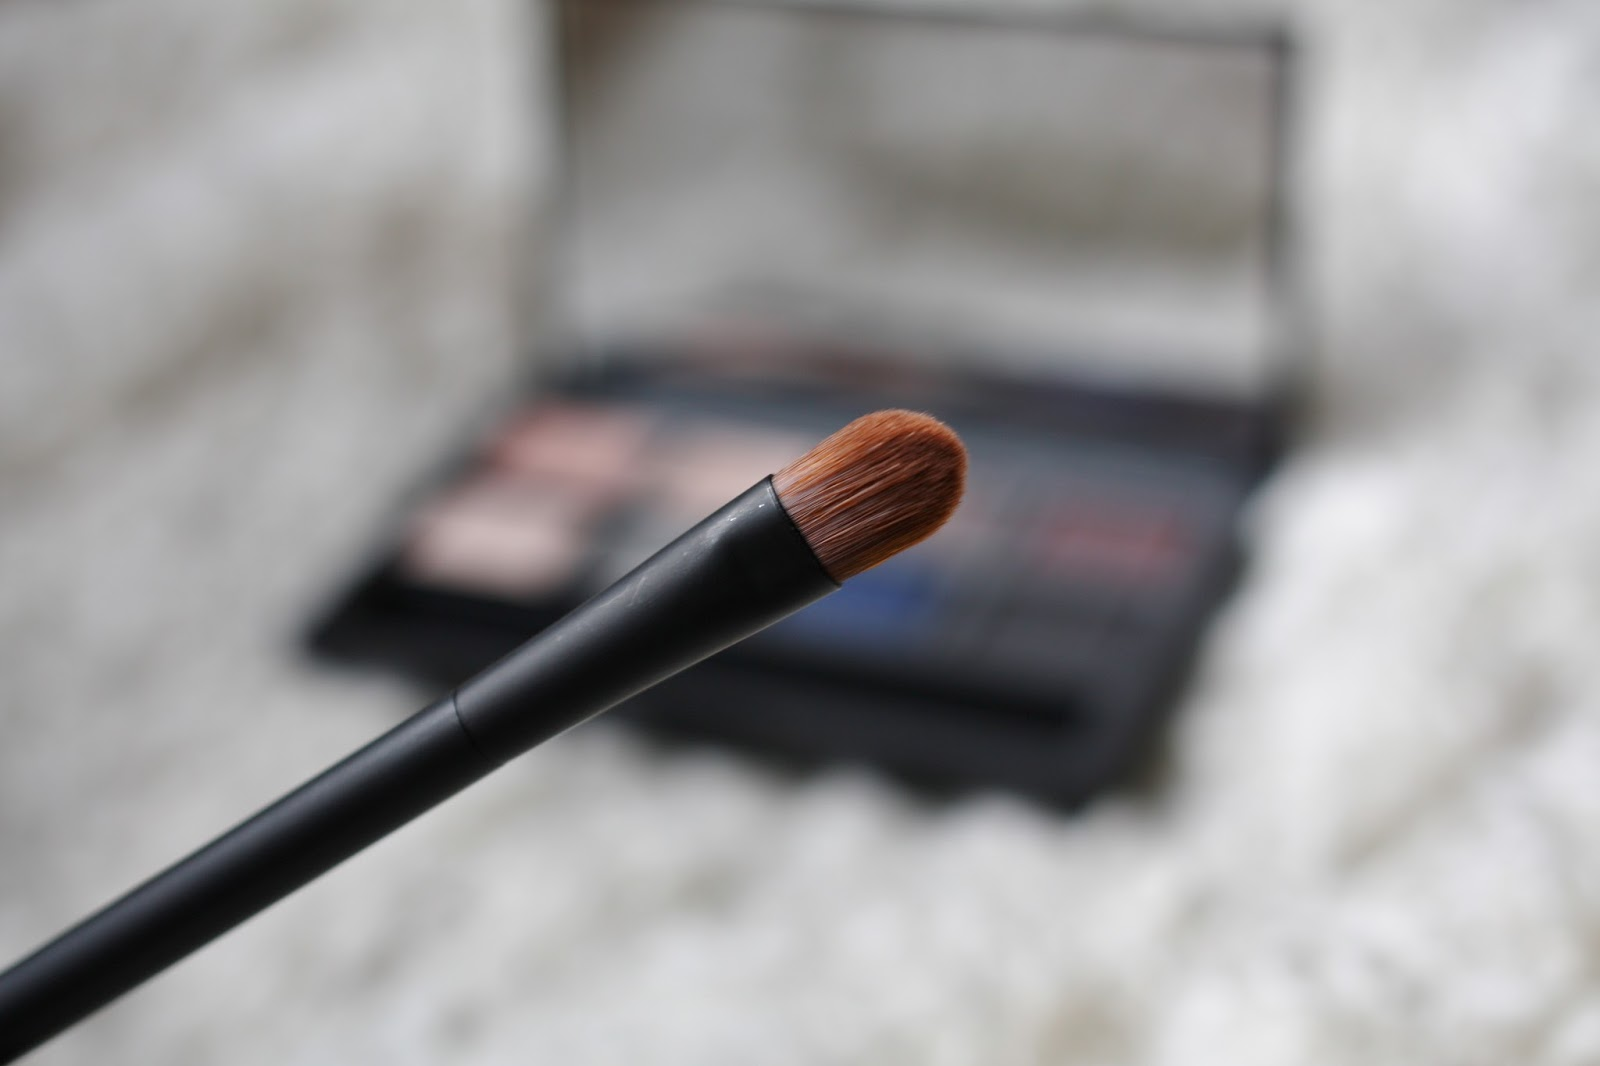 Nars Dual Intensity Eyeshadow Palette Wet and Dry Travel Brush